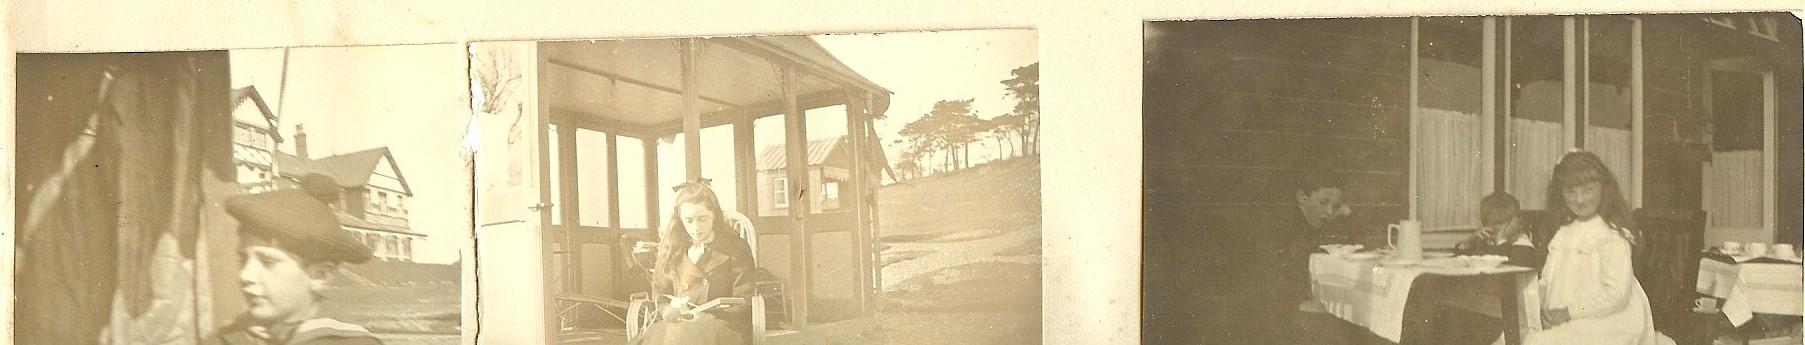 Easter 1901 - W J Fanning's son at the sanatorium